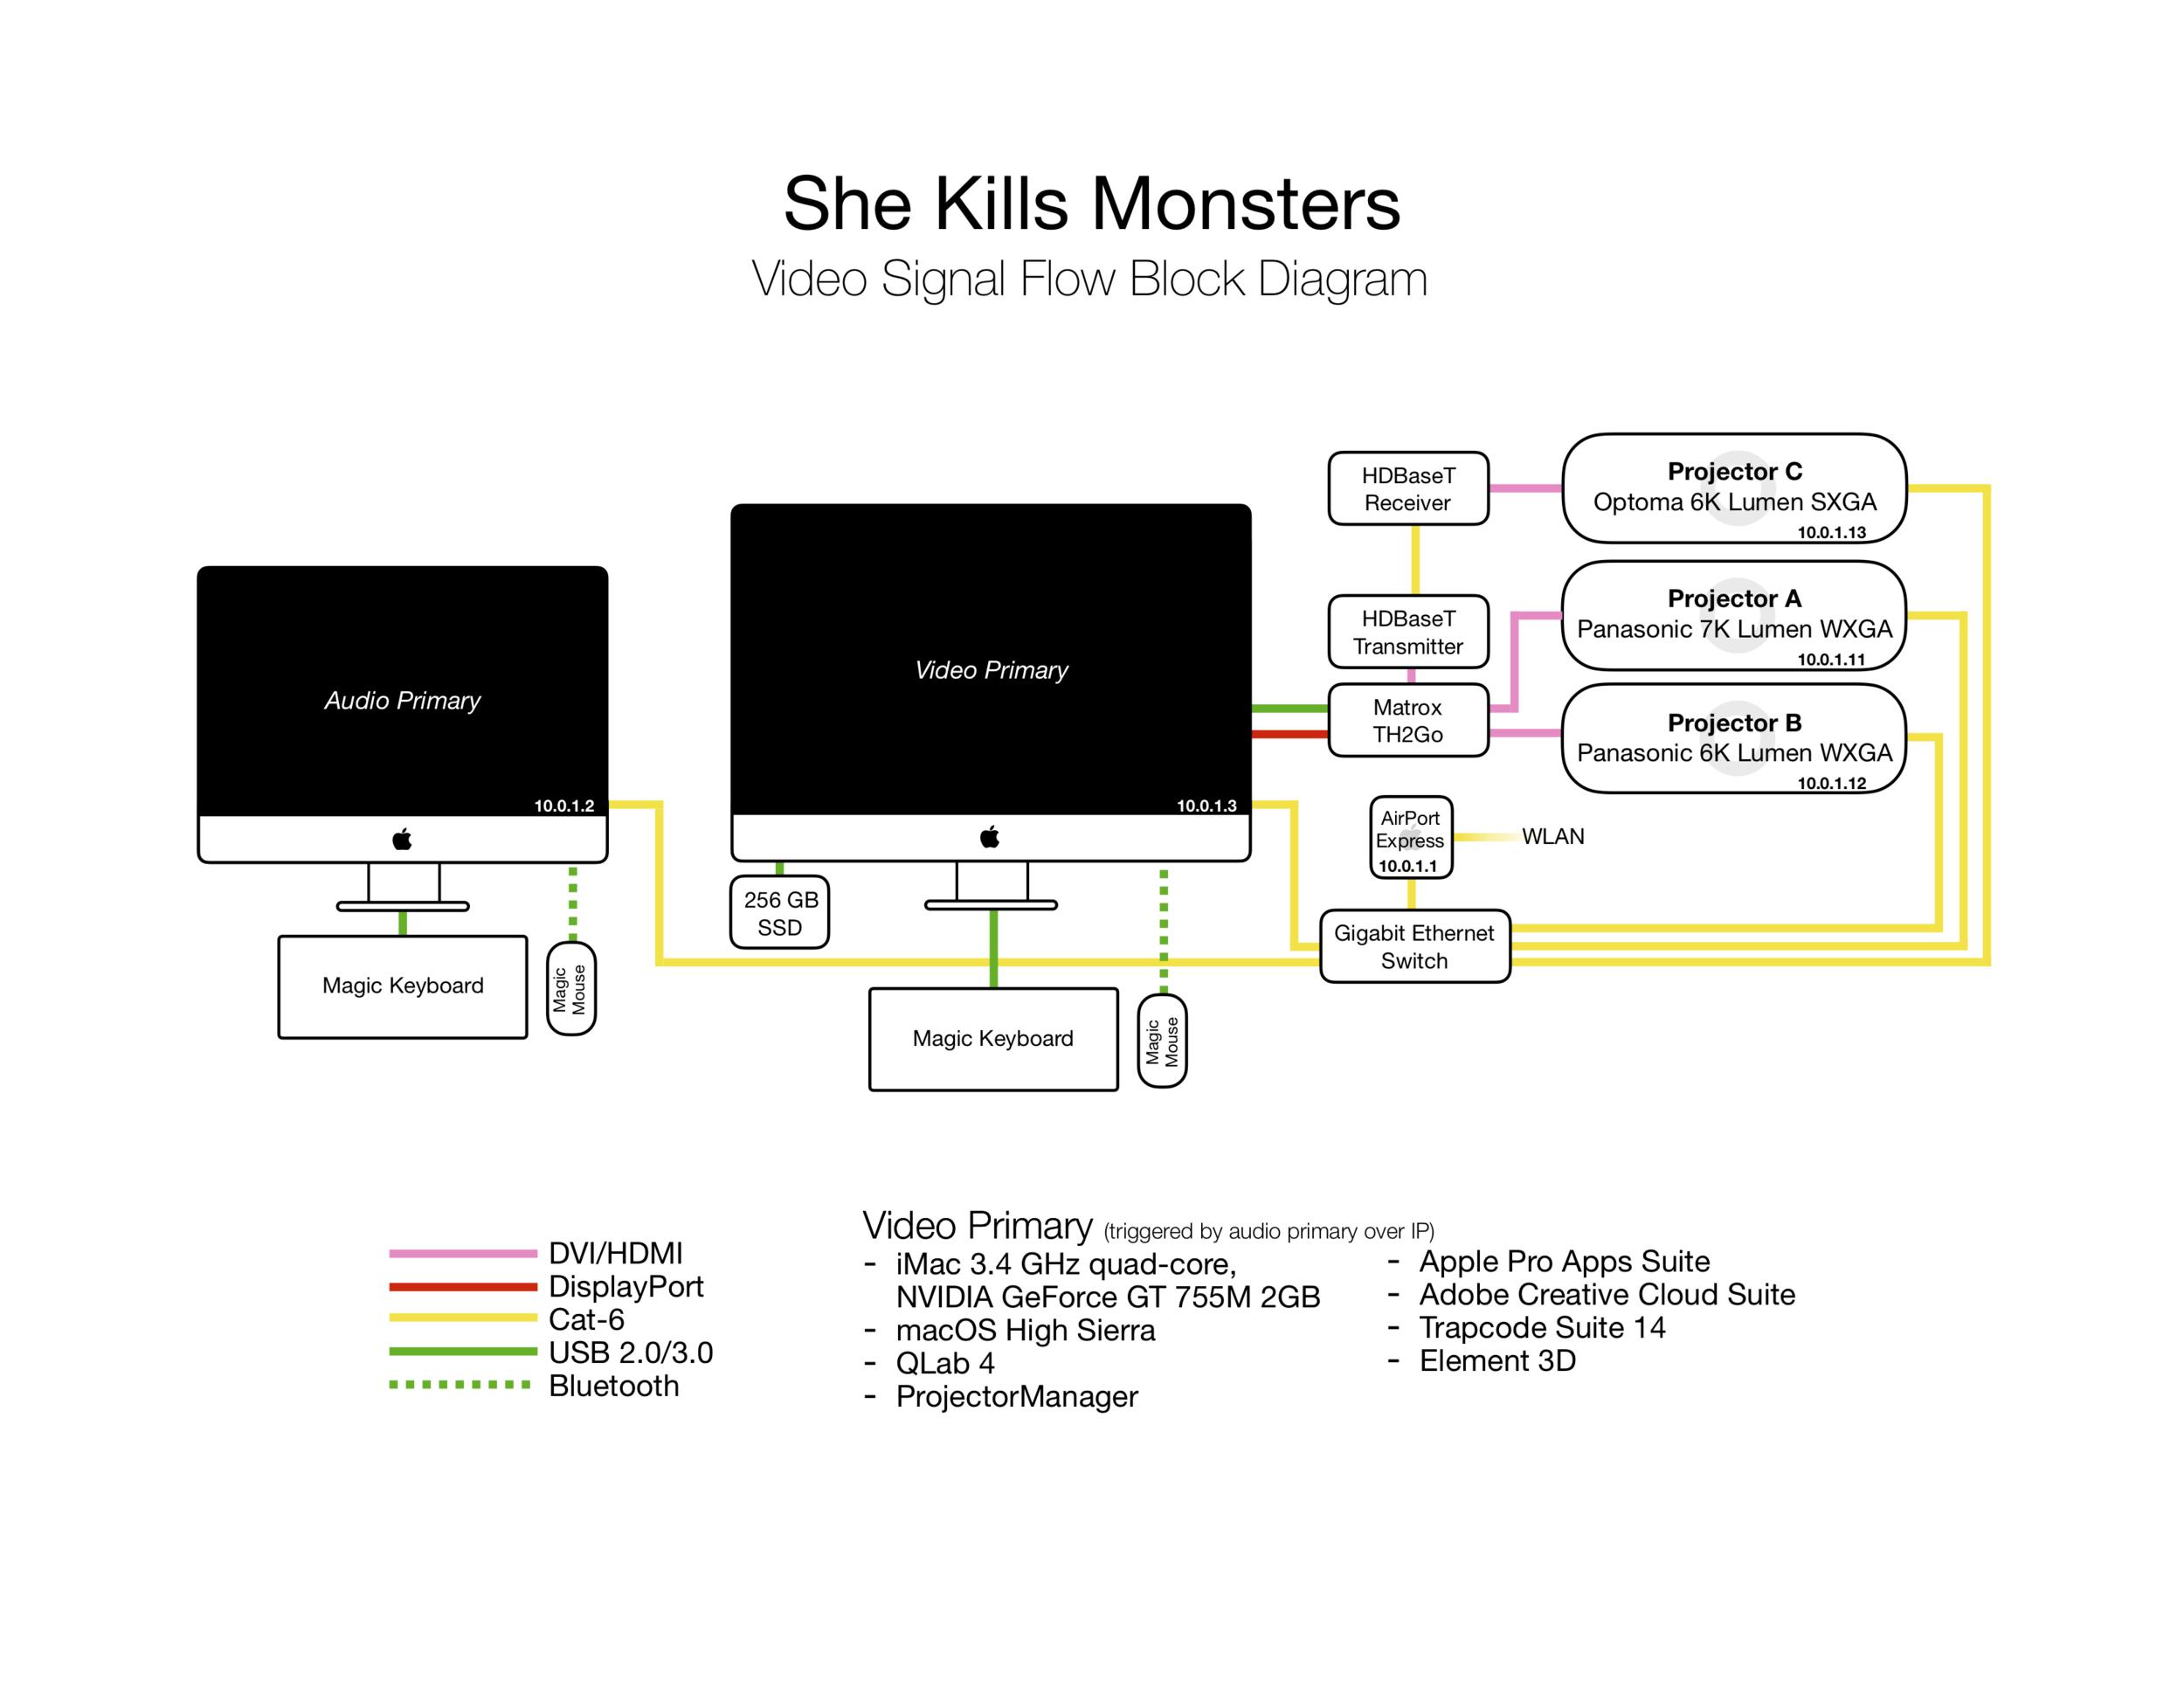 jackson-cobb-design-she-kills-monsters-block-diagram.png